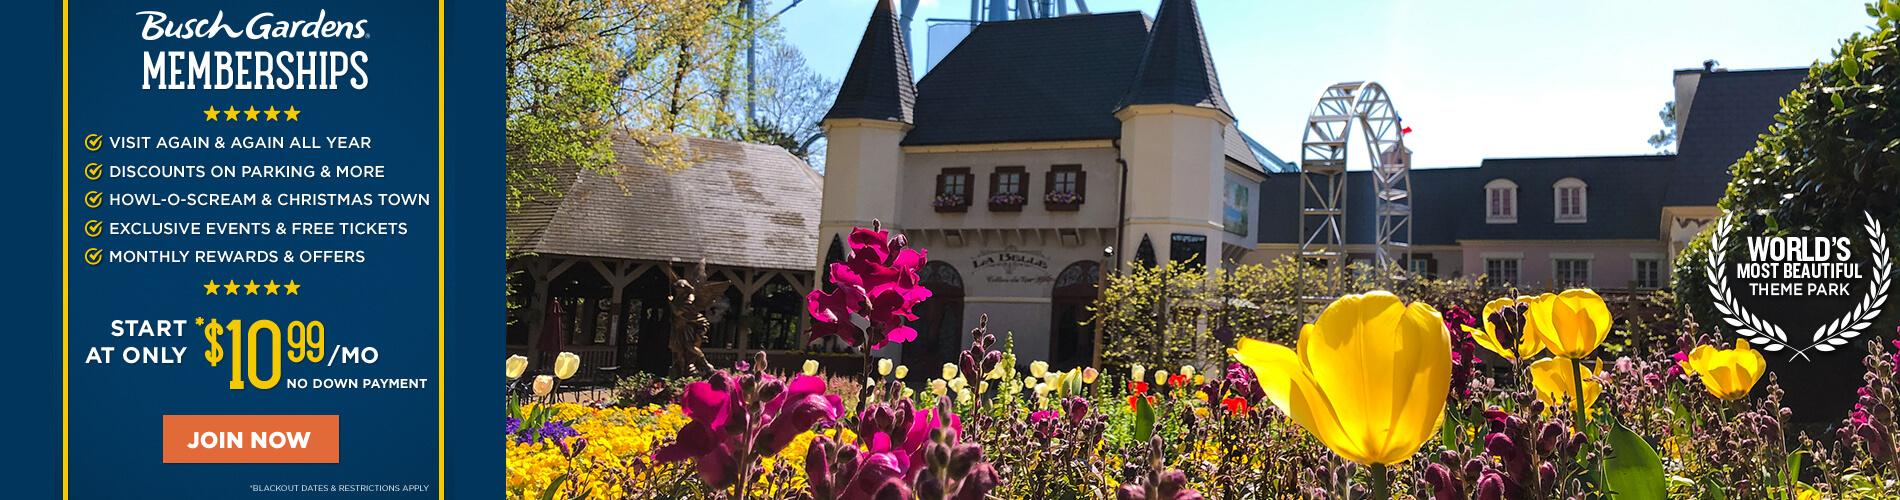 Busch Gardens Williamsburg Membership Plans starting at $10.99/month.